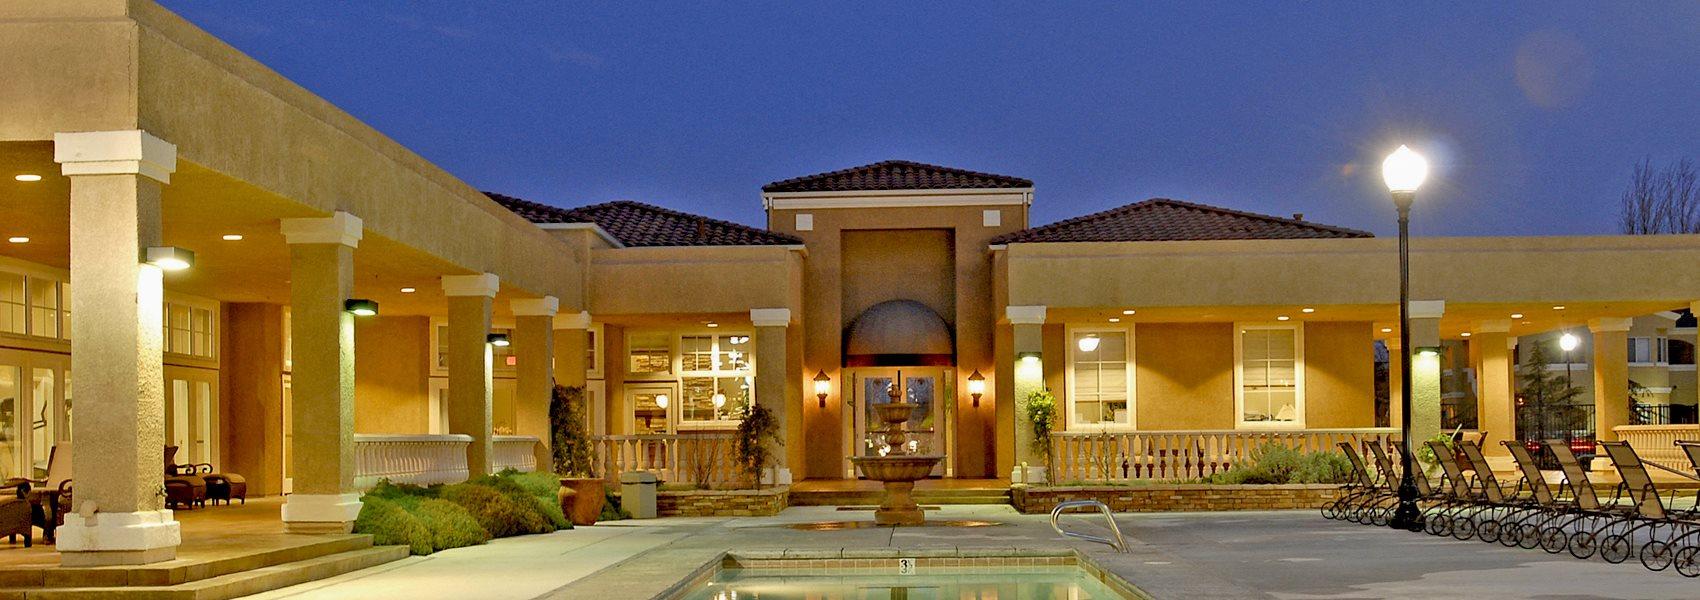 Evening Pool Siena Villas Apts for rent in Elk Grove Ca